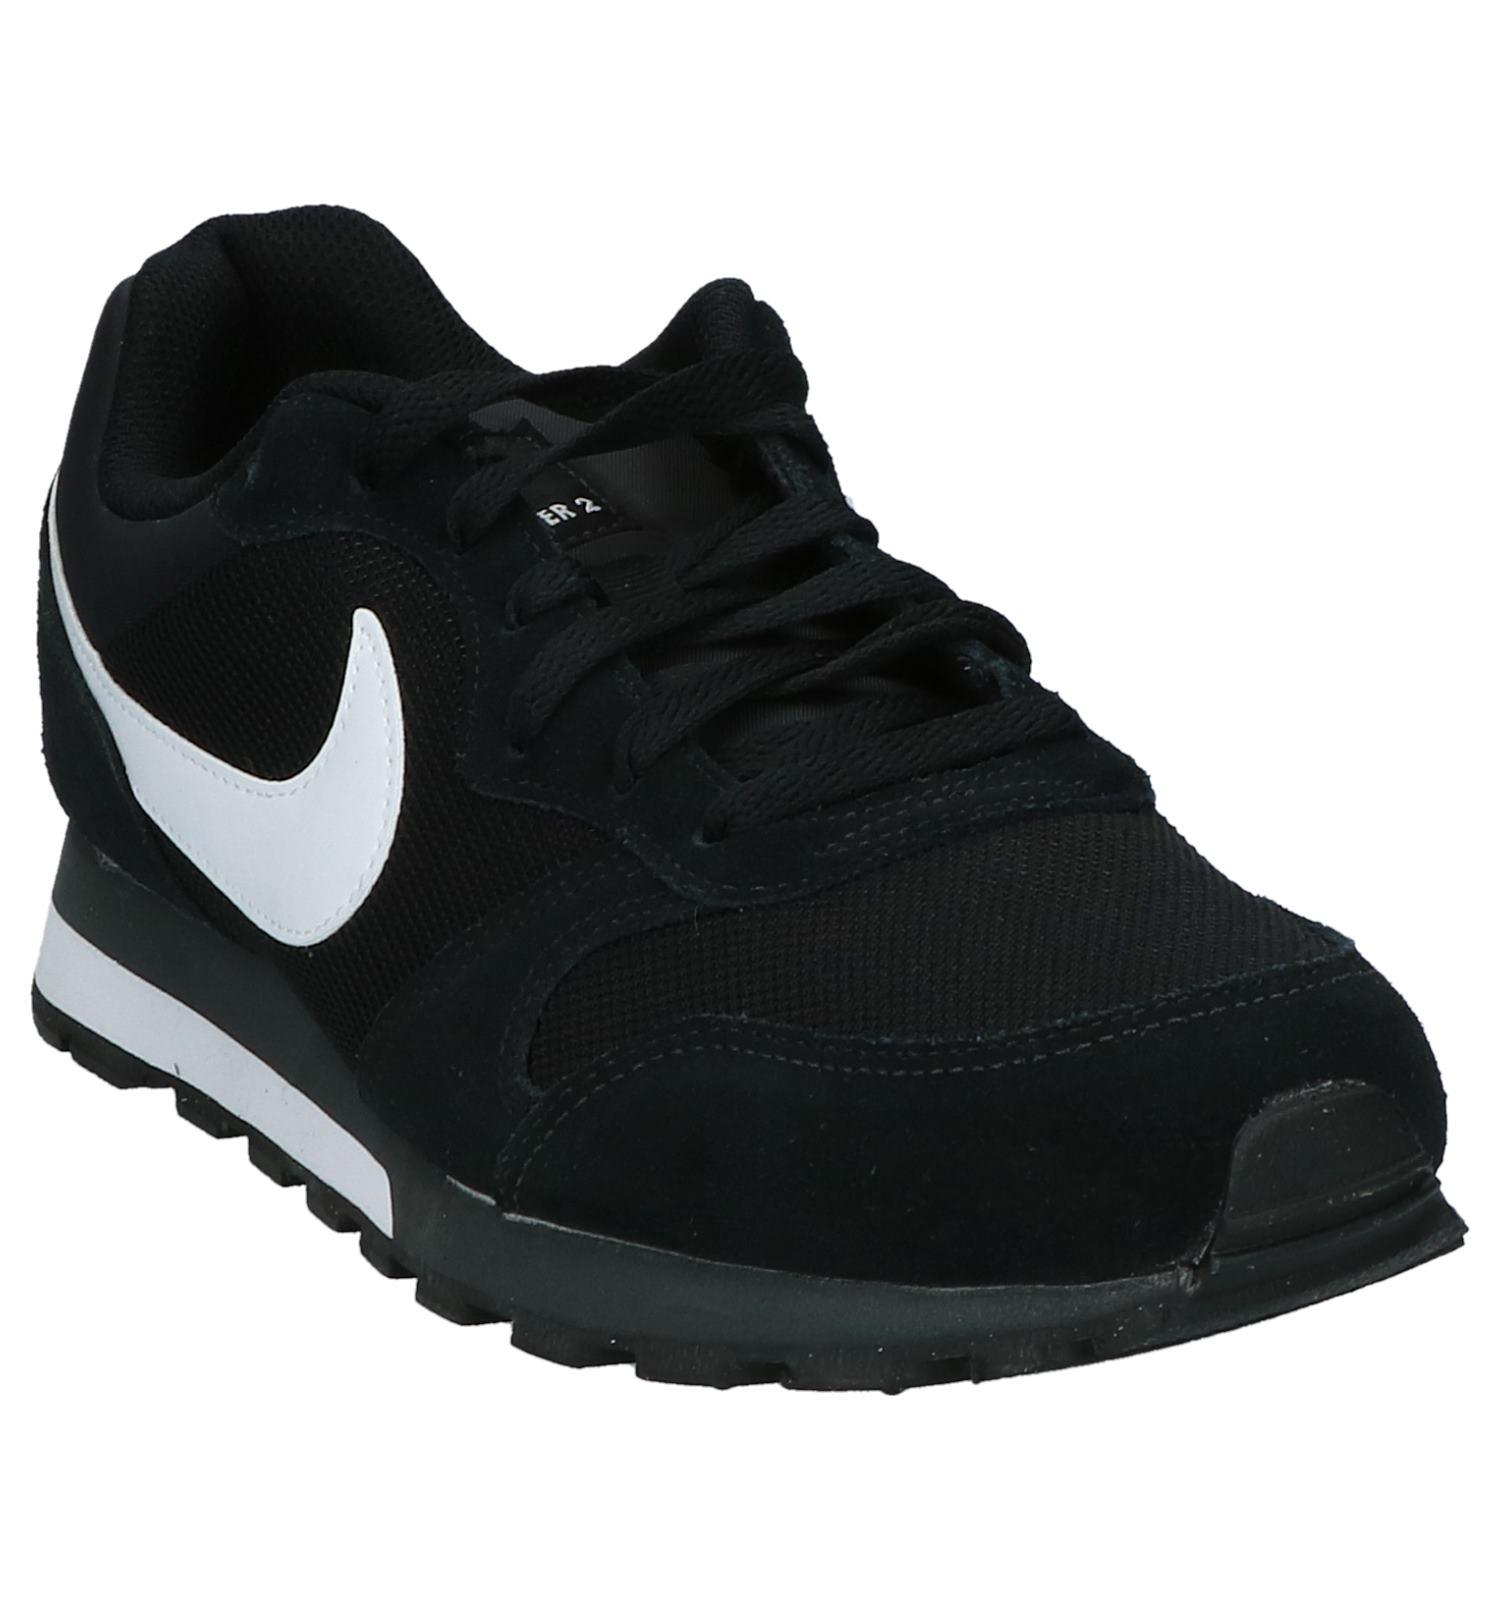 448b85bec25 Zwarte Lage Sneakers Nike MD Runner 2 | TORFS.BE | Gratis verzend en retour